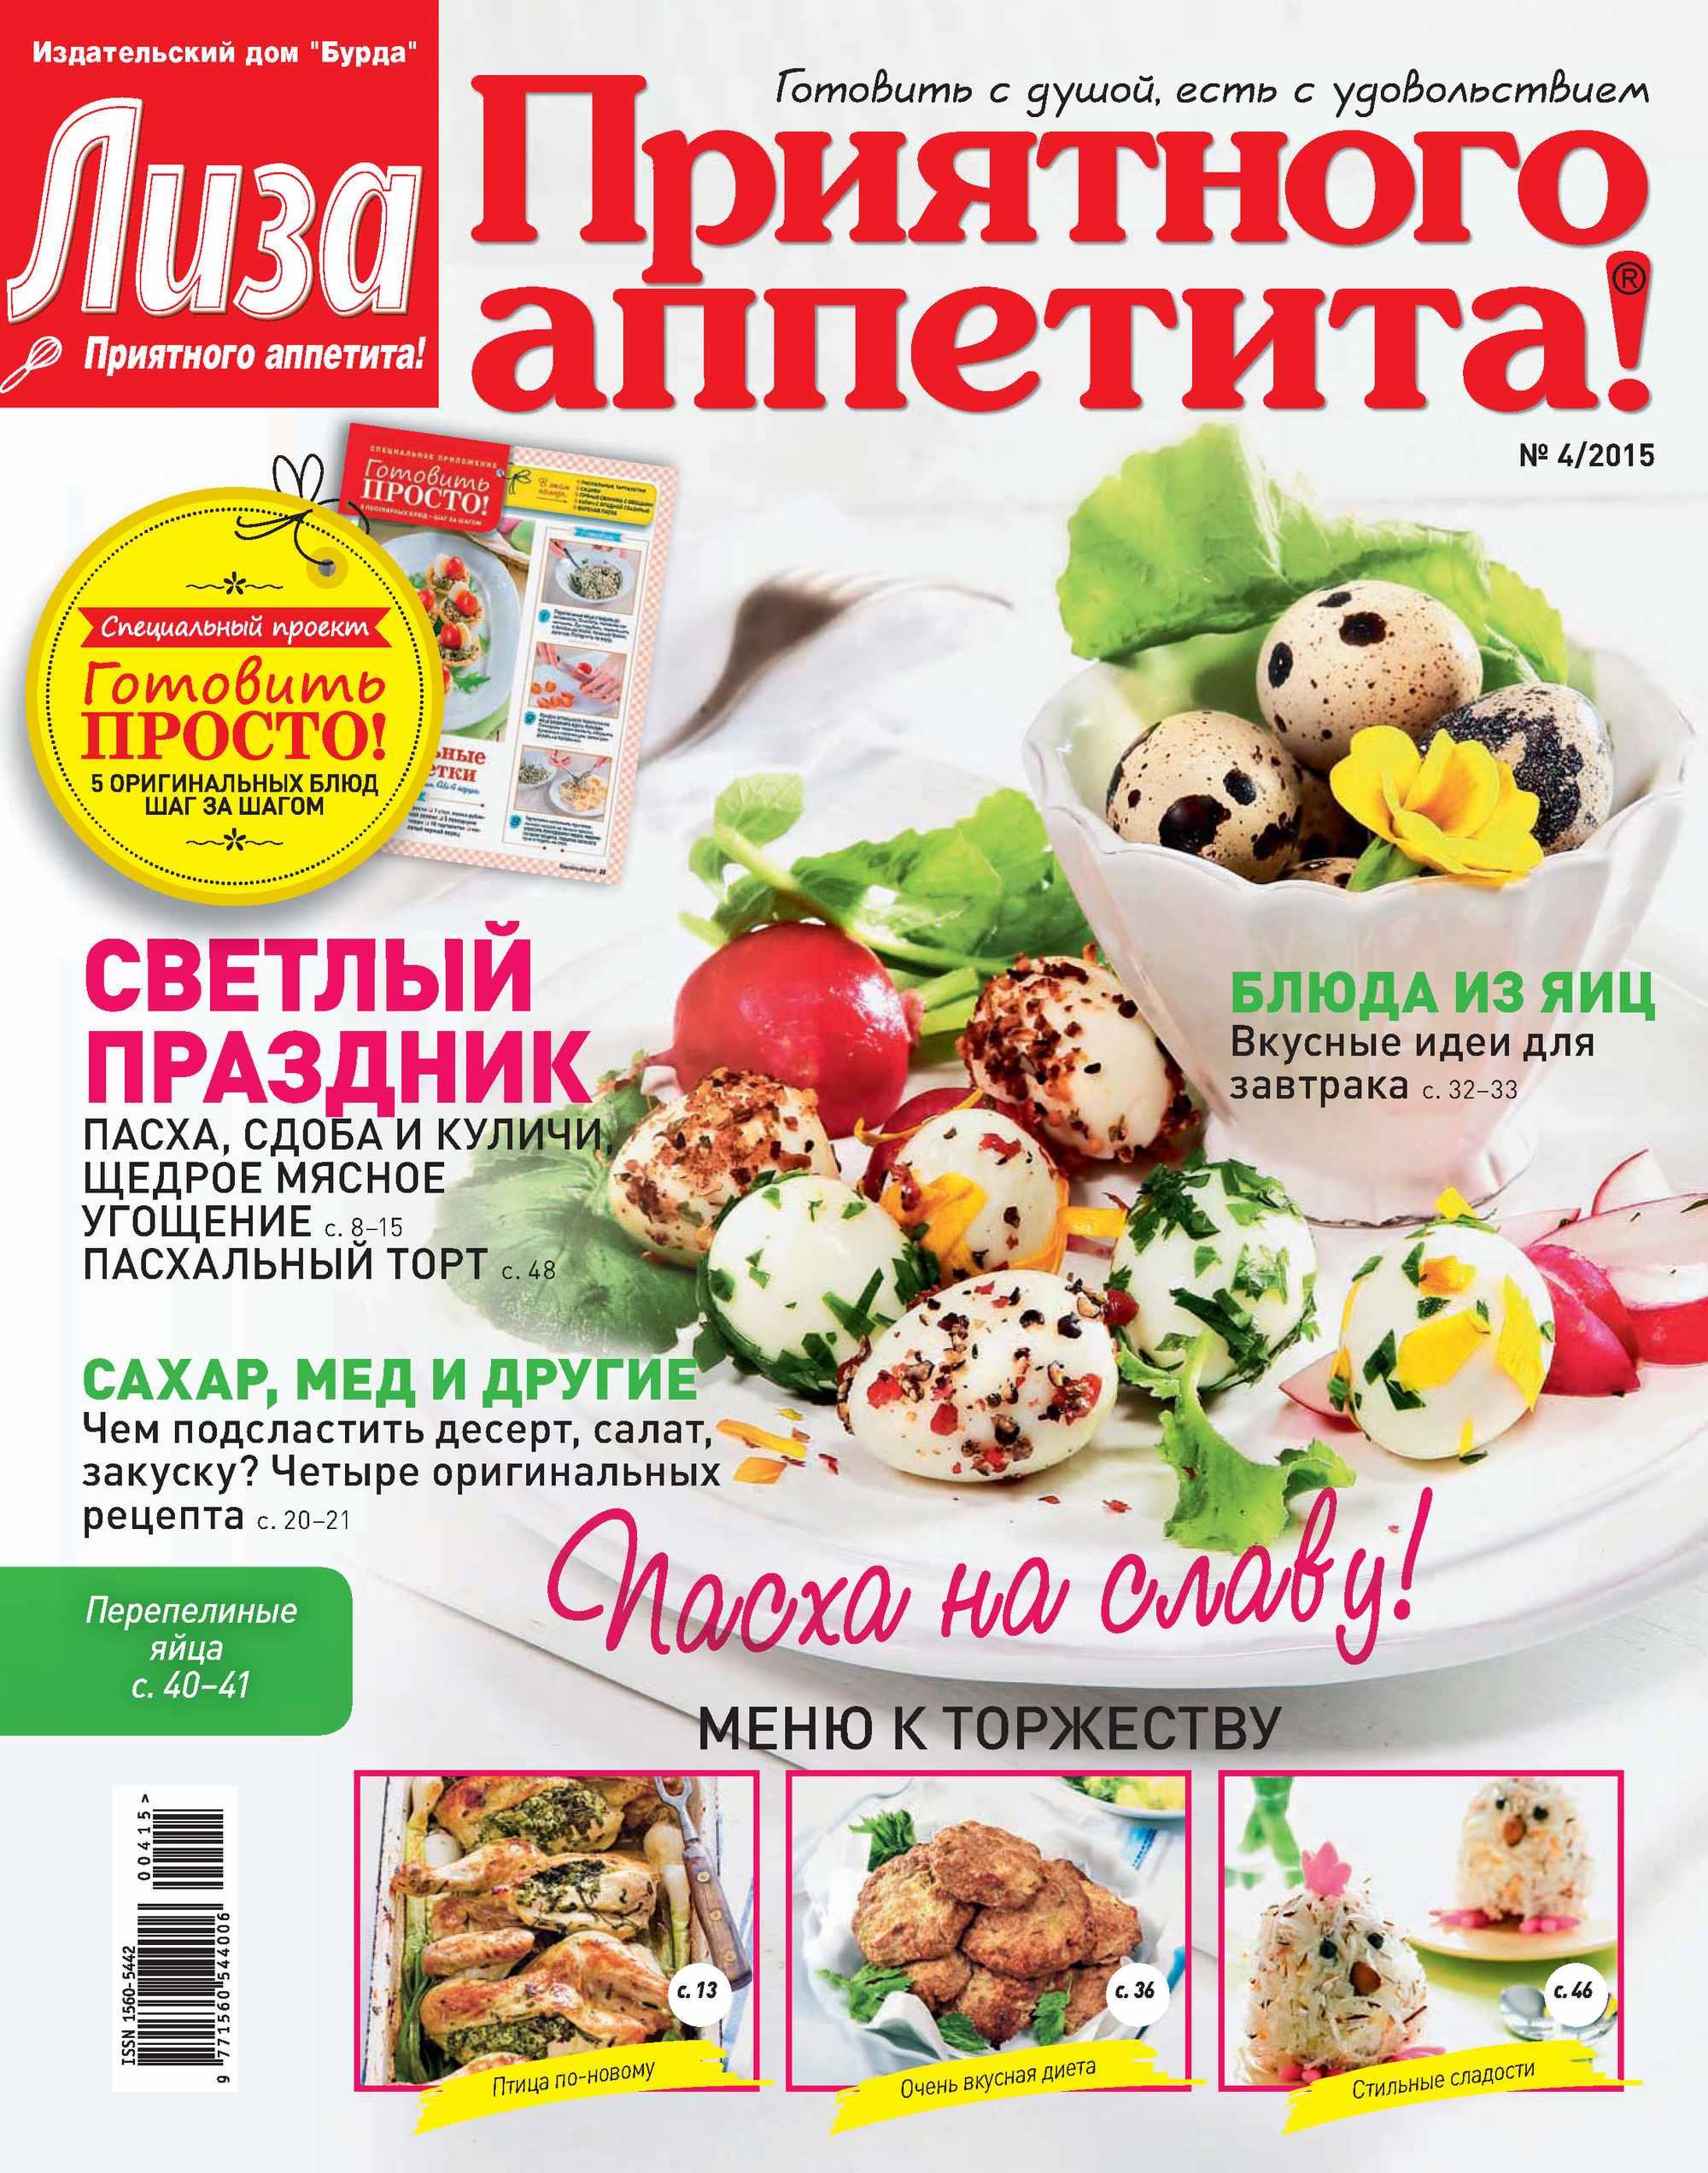 ИД «Бурда» Журнал «Лиза. Приятного аппетита» №04/2015 ид бурда журнал лиза приятного аппетита 04 2015